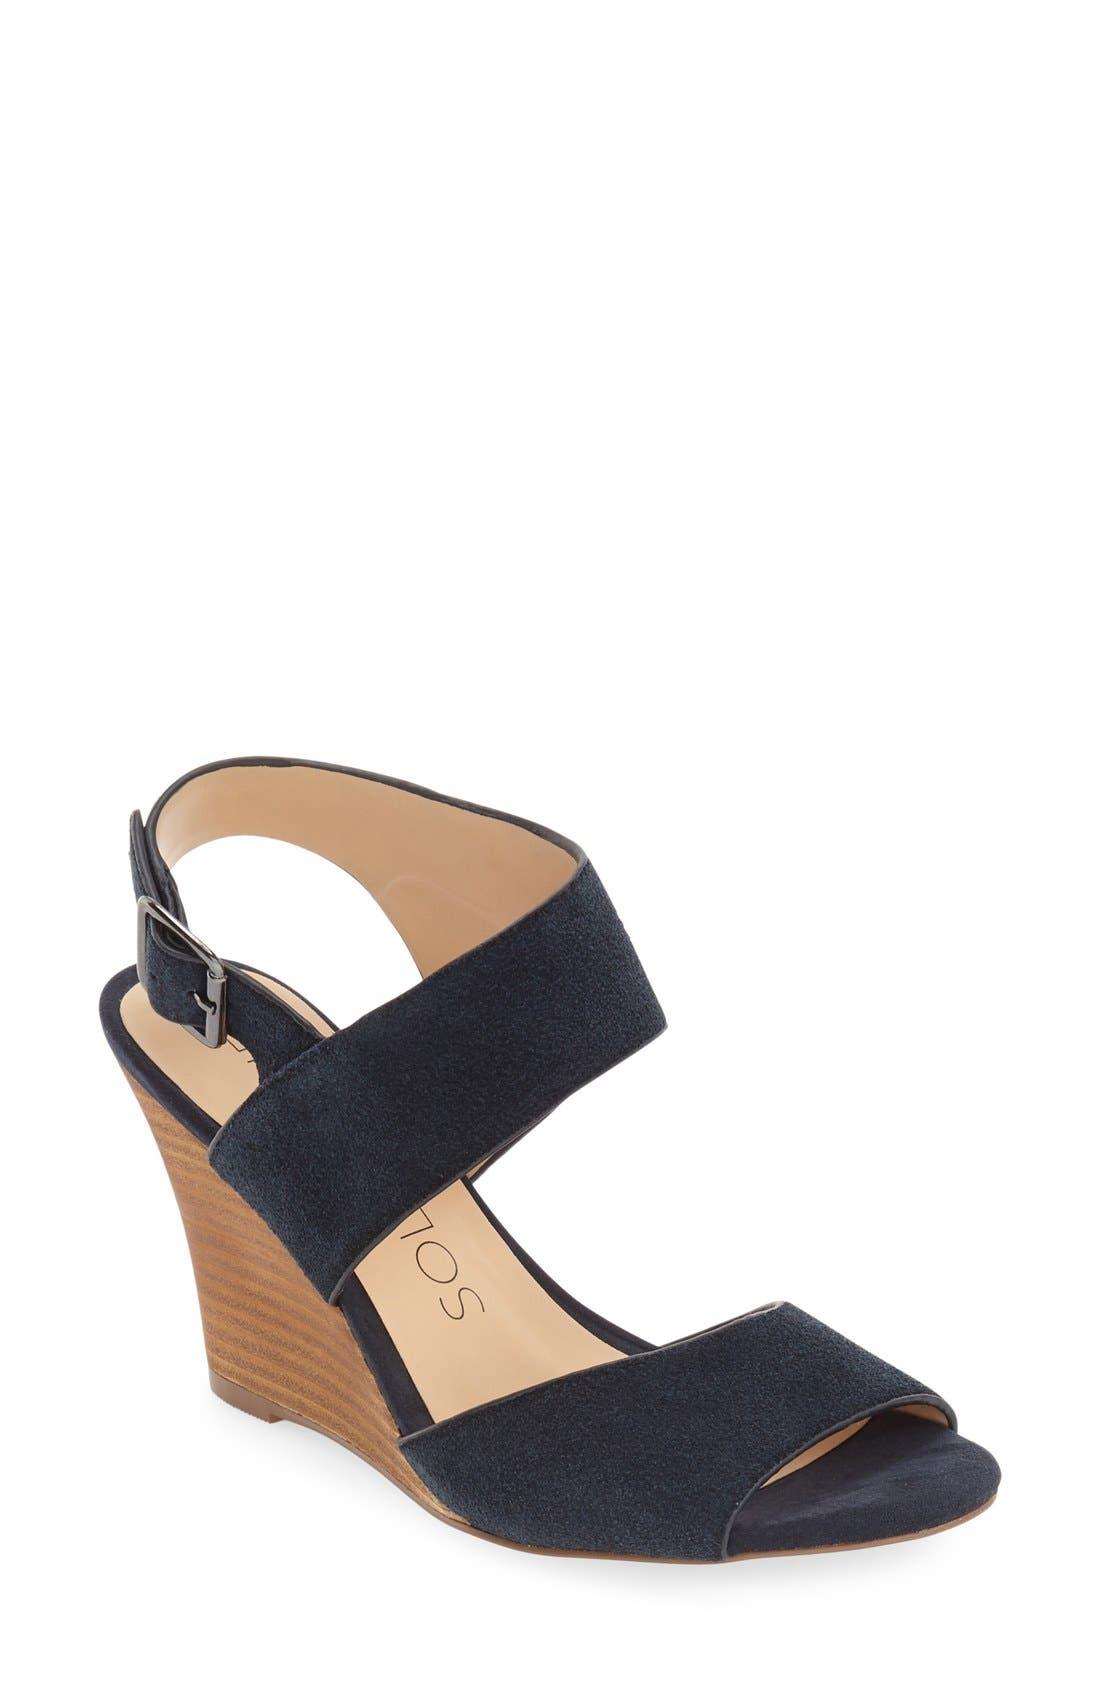 Main Image - Sole Society 'Landry' Wedge Sandal (Women)